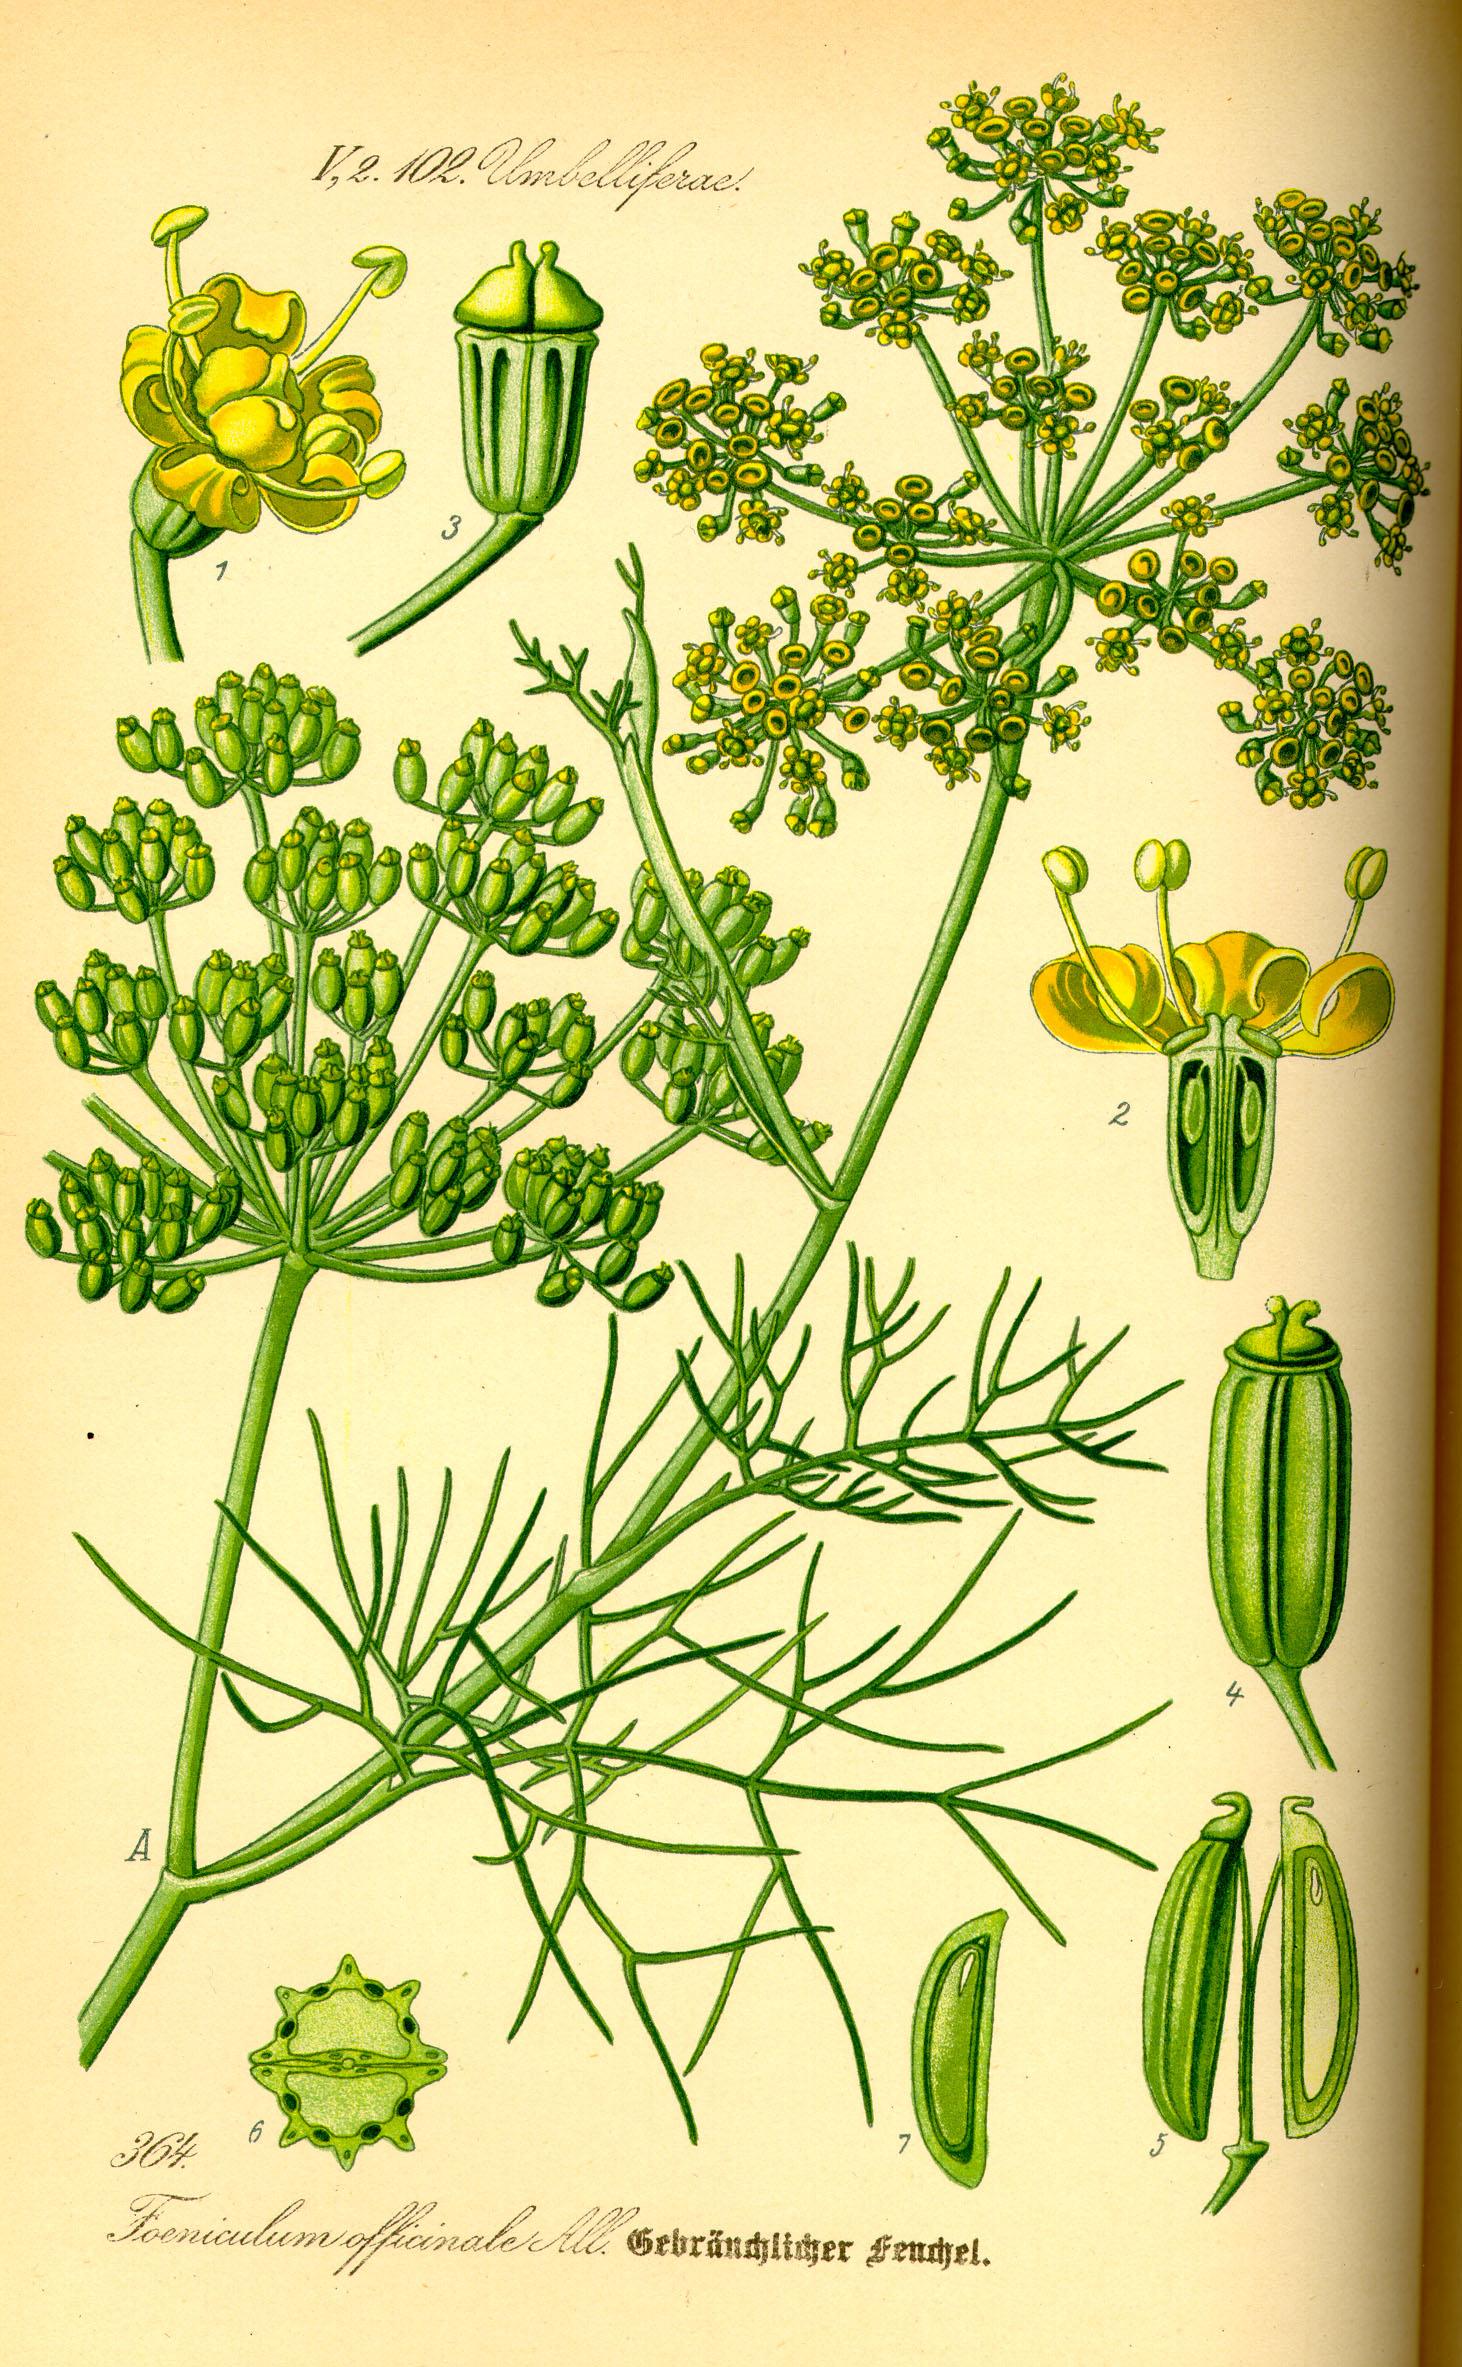 Súbor:illustration foeniculum vulgare0